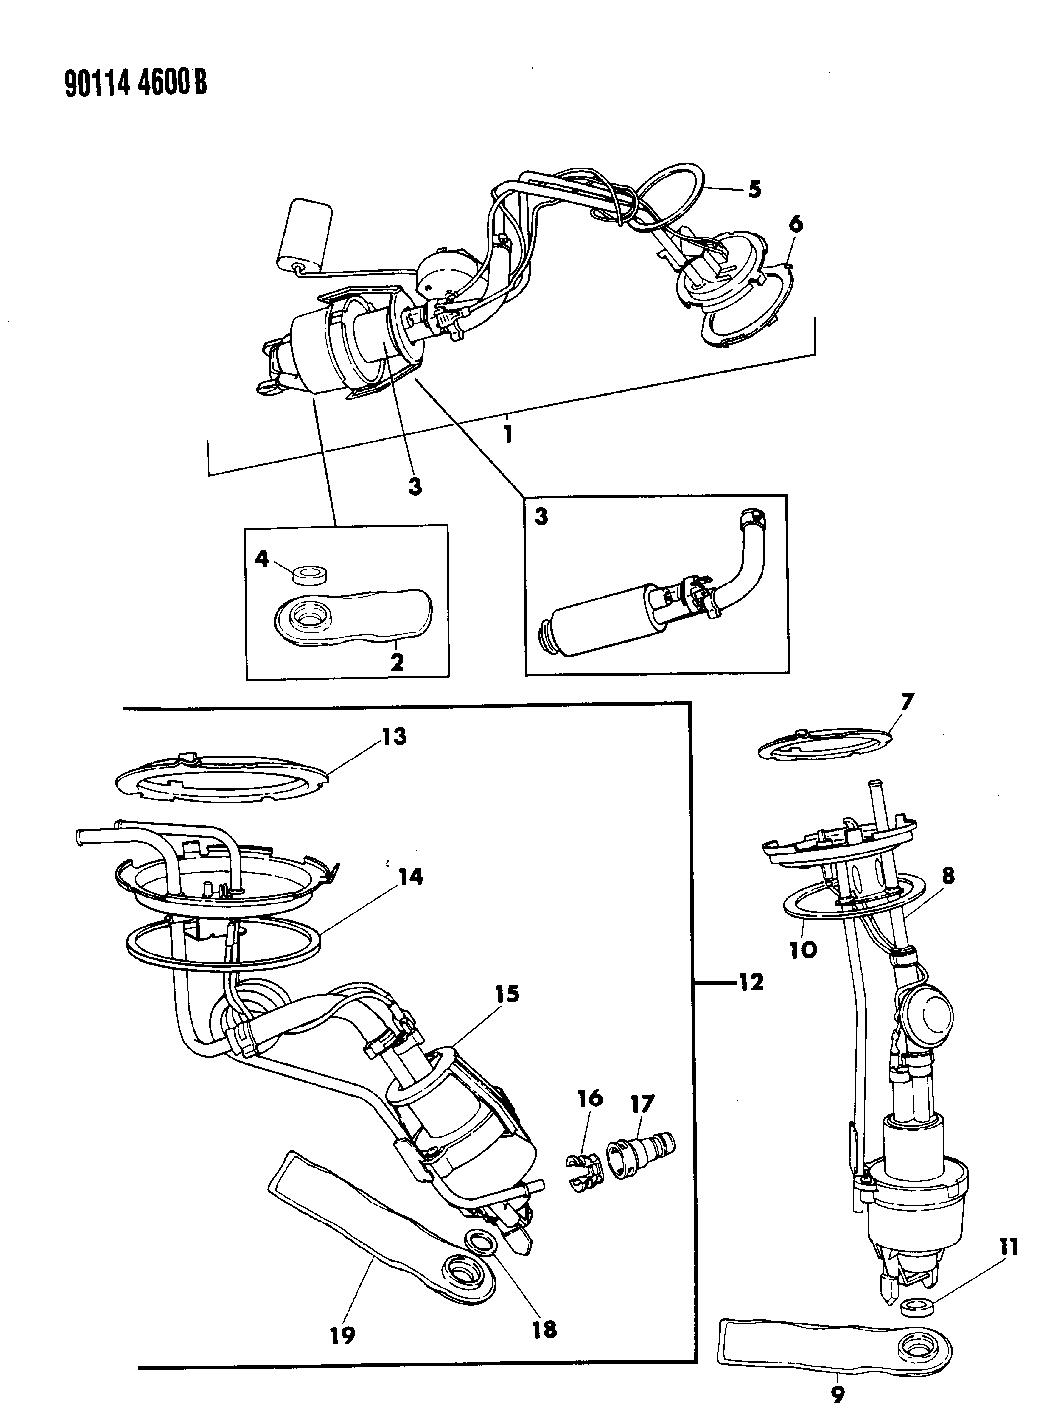 1990 Chrysler Imperial Fuel Pump